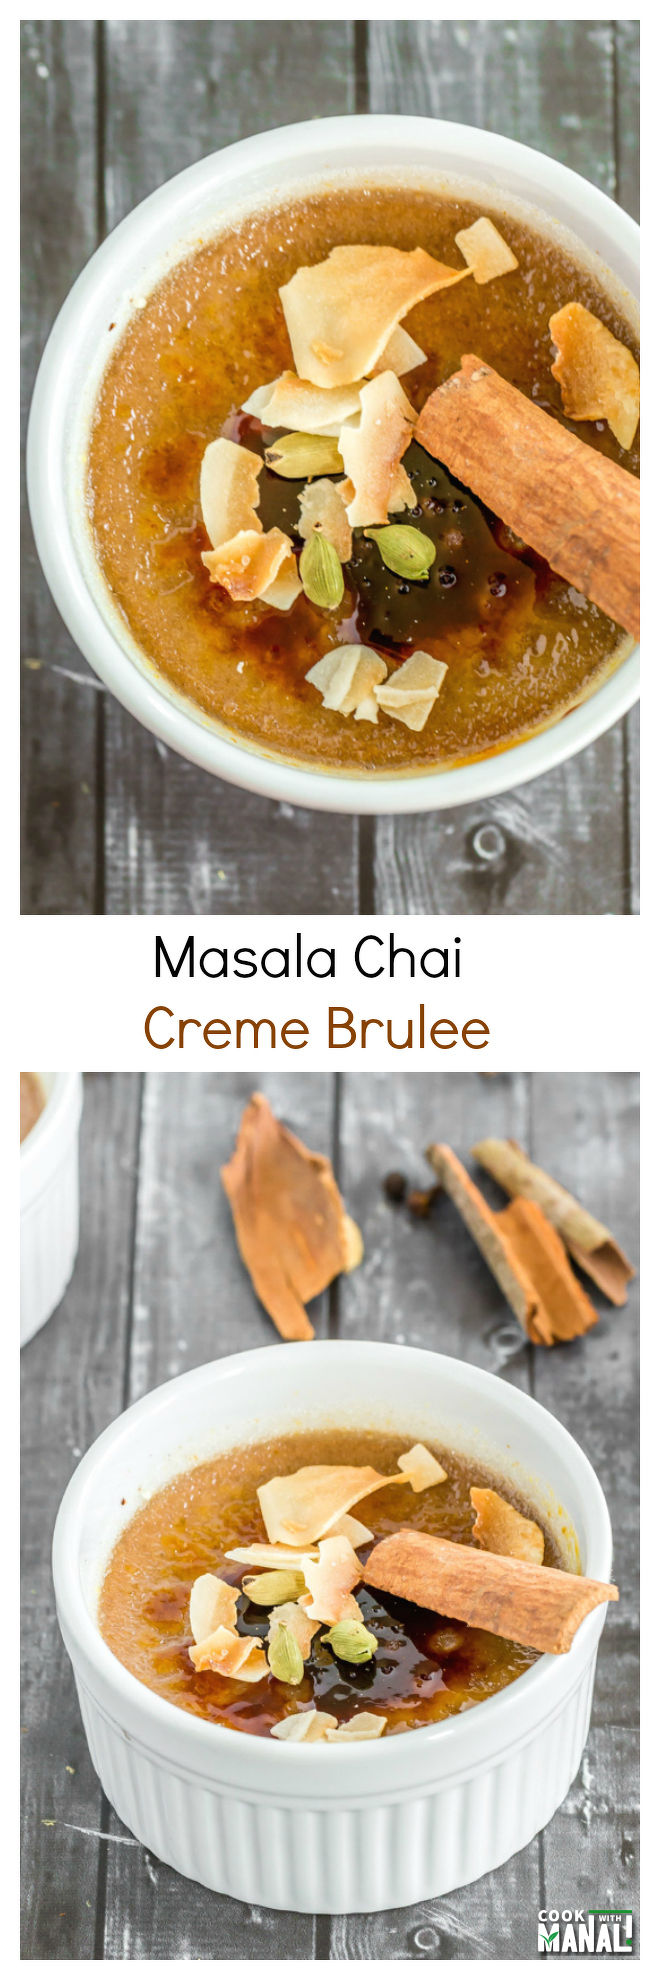 Masala Chai Creme Brulee-Collage